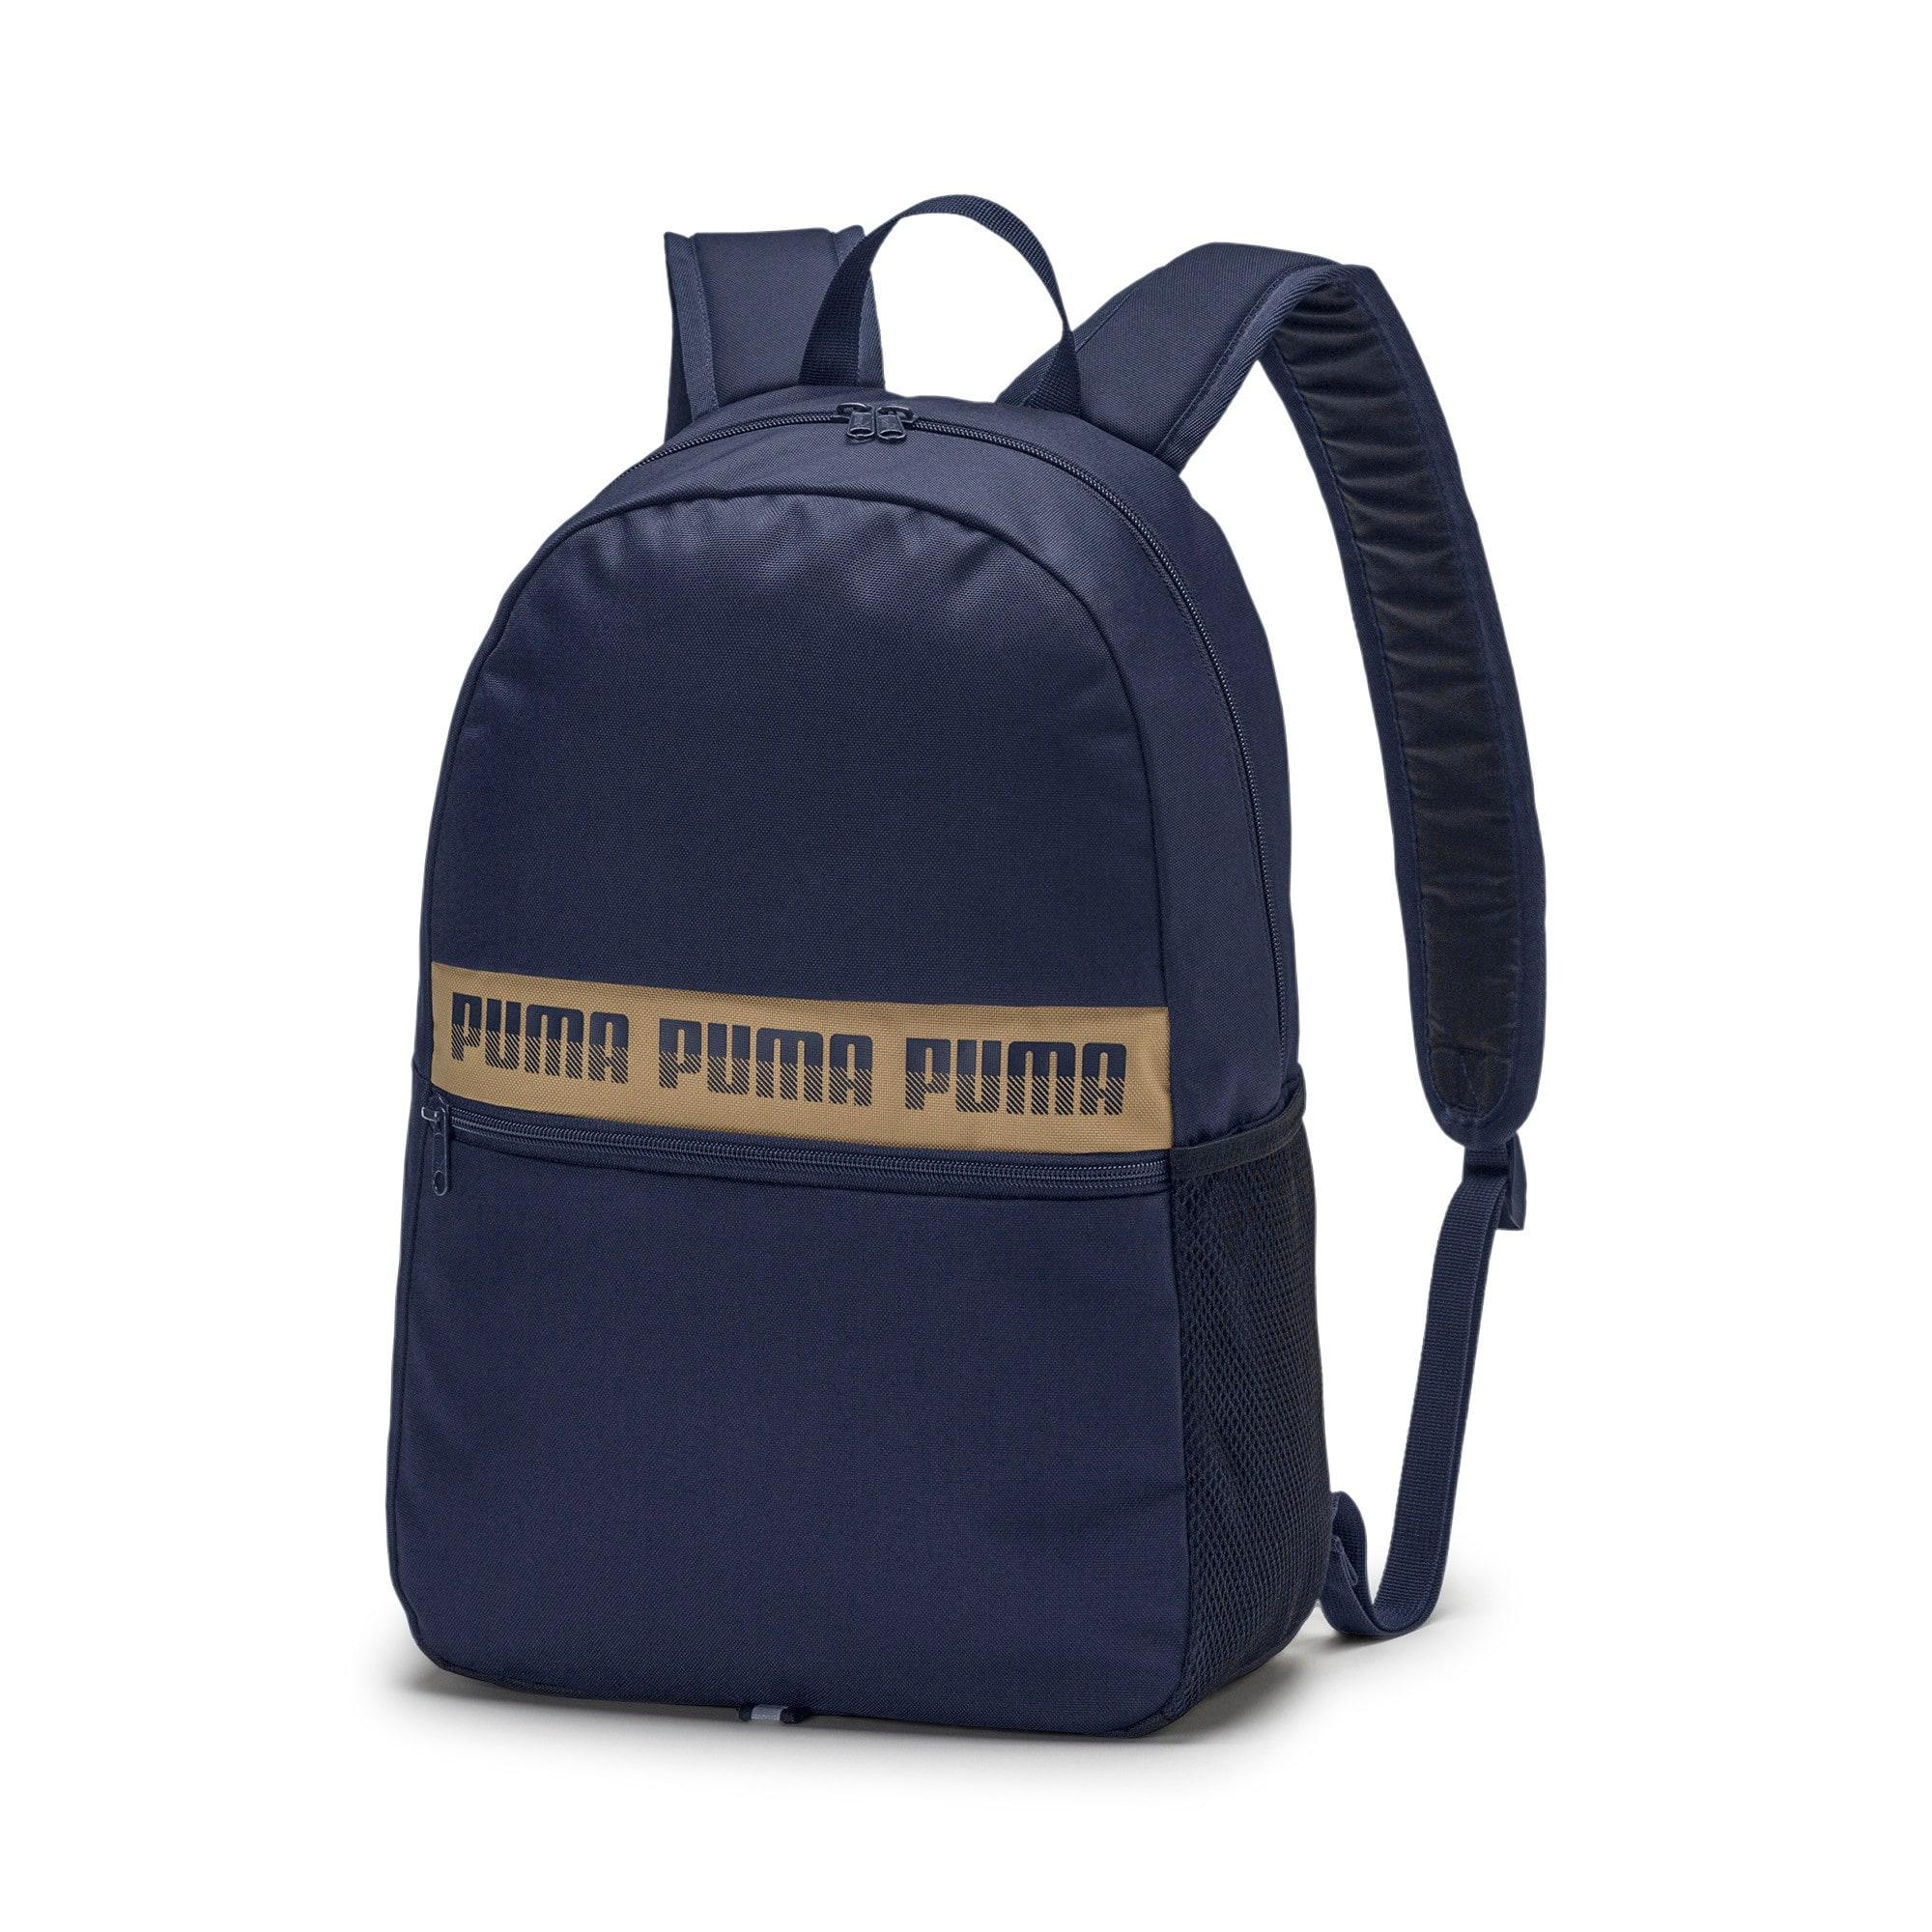 Thumbnail 1 of Phase Backpack II, Peacoat, medium-IND